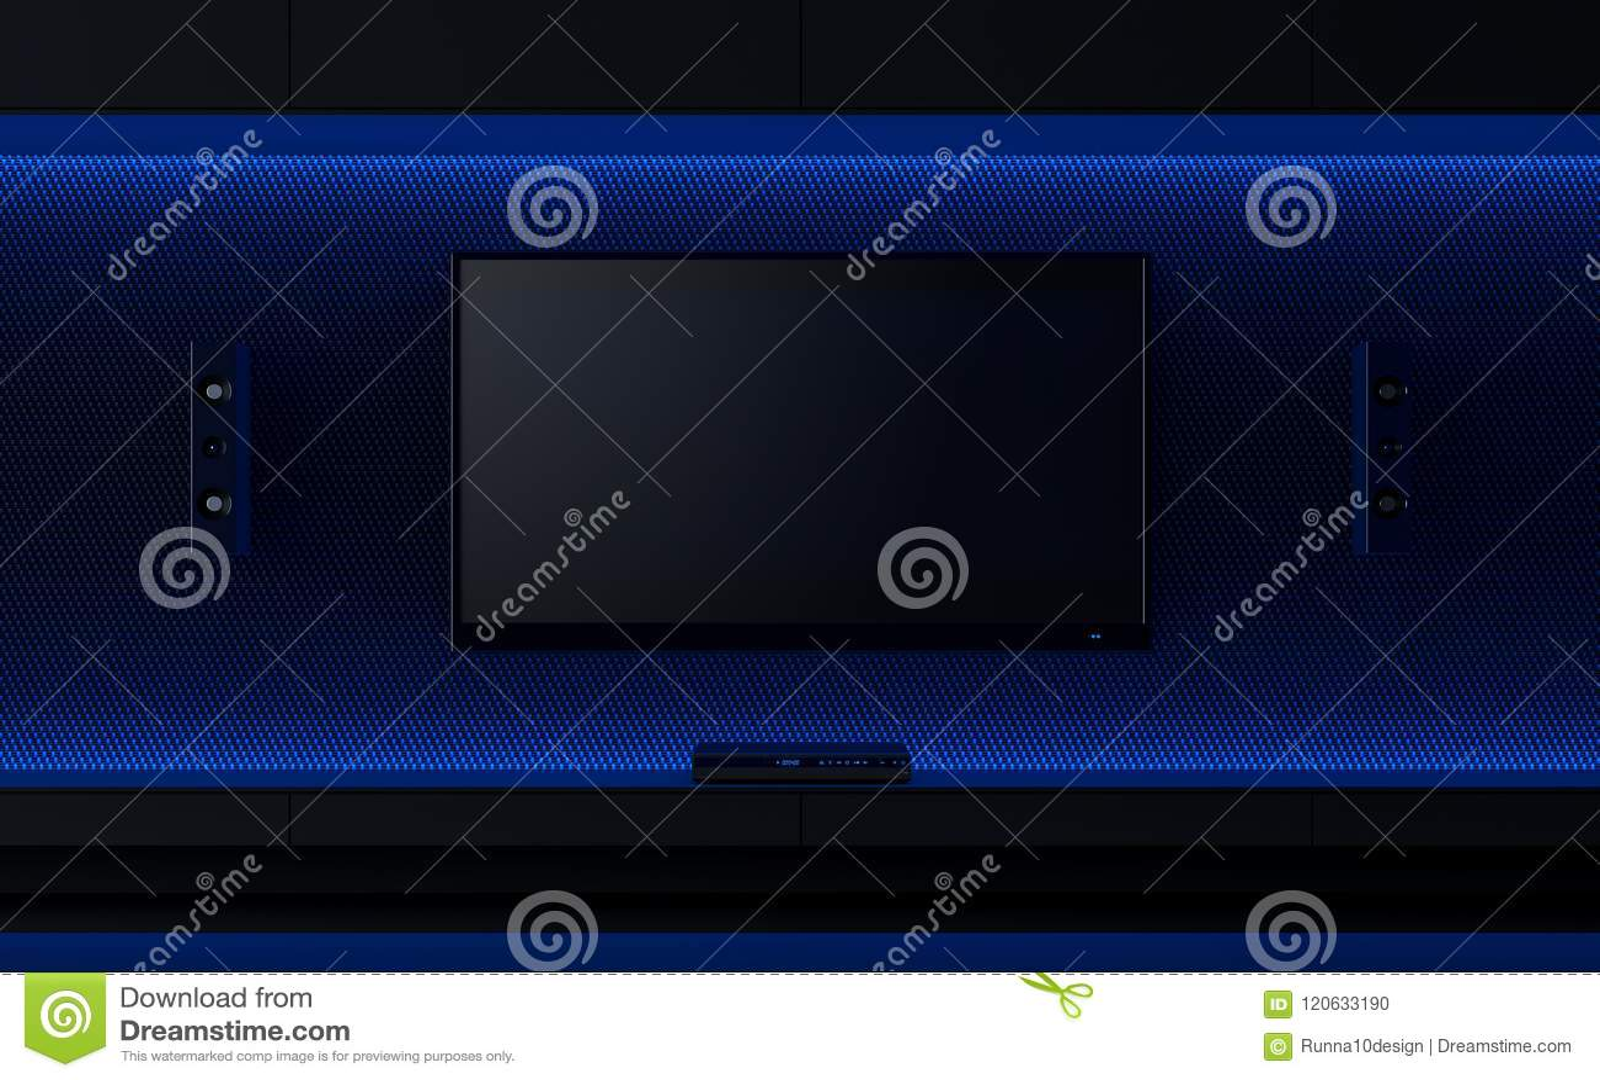 Tv Wall Design Idea 3d Render Stock Illustration Illustration Of Didgtal Minimalist 120633190